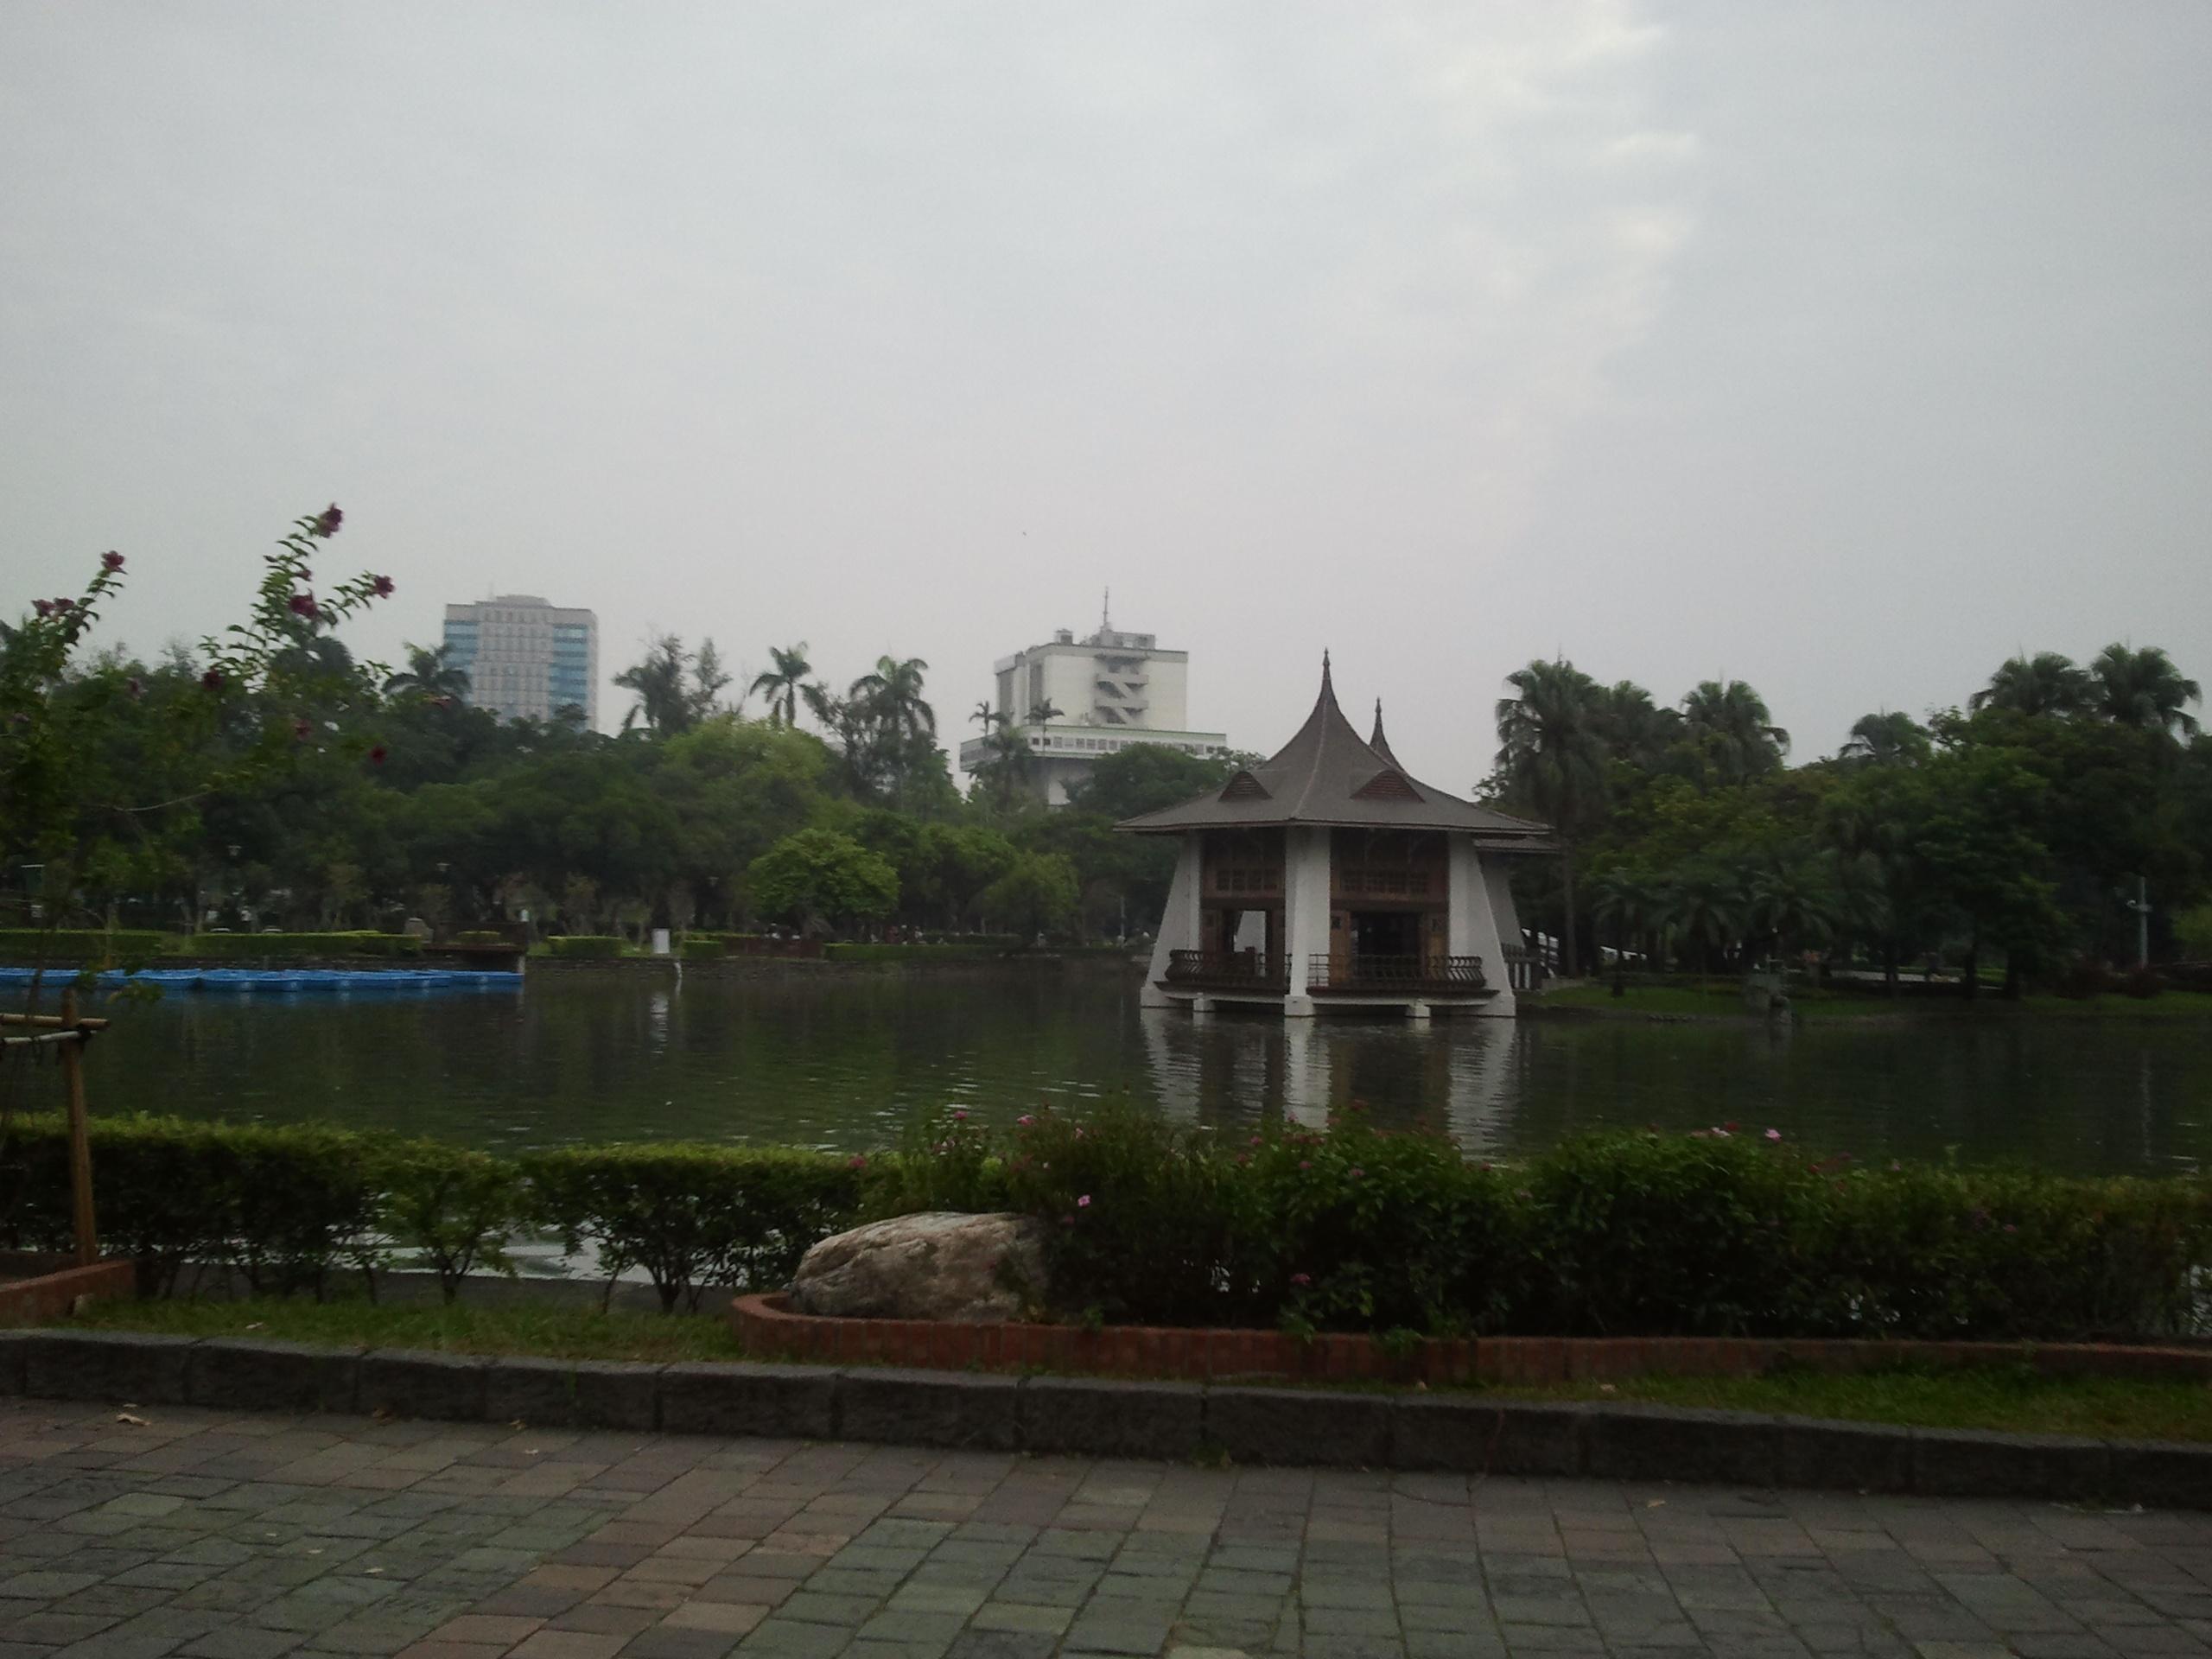 Taichung park, house